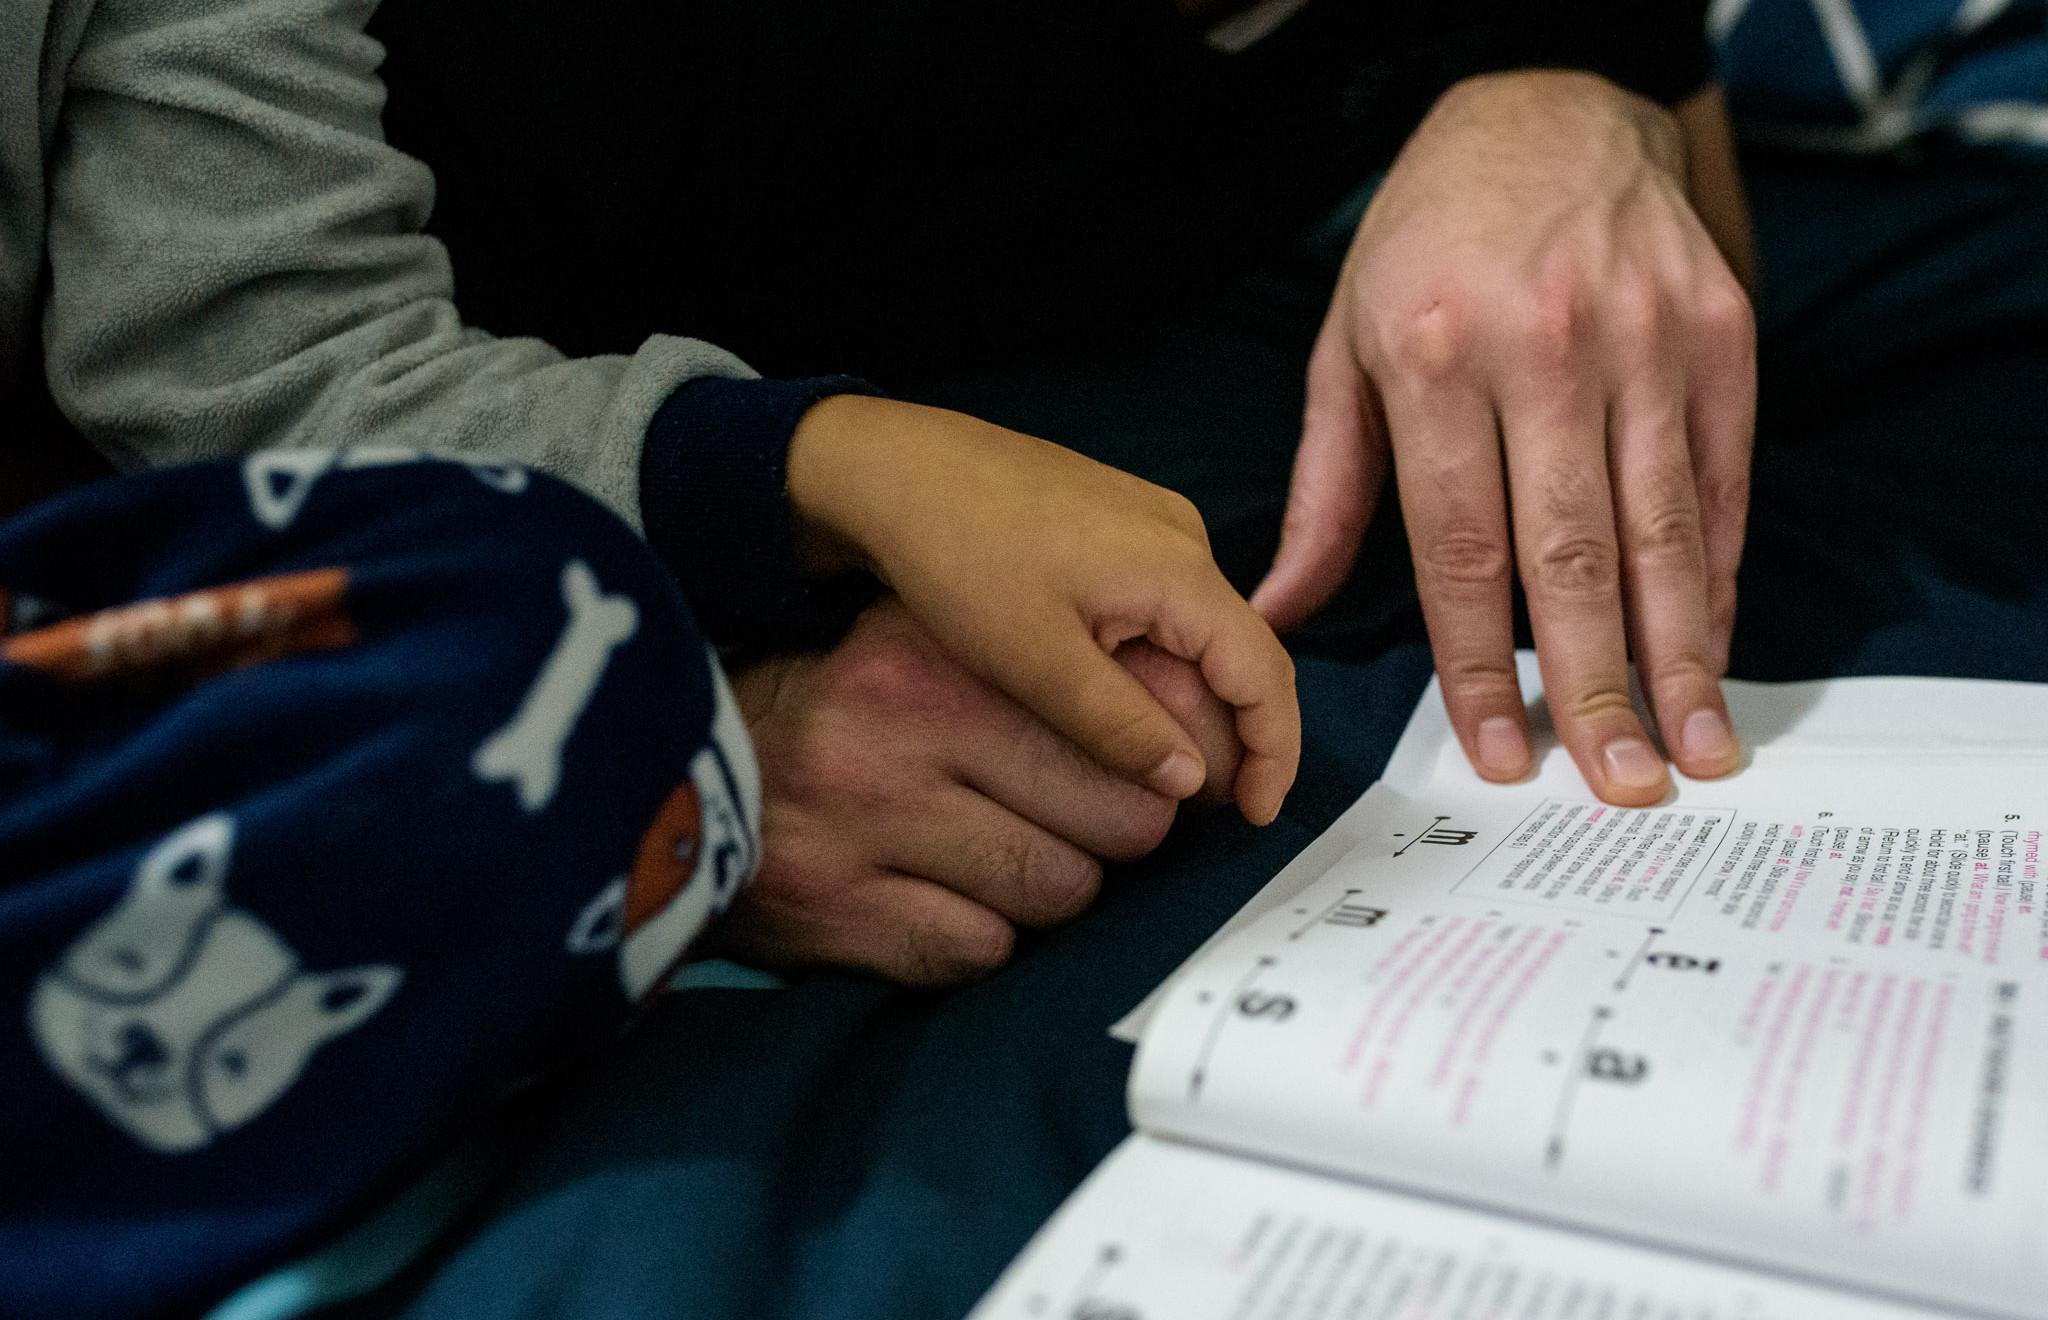 dad teaches son to read